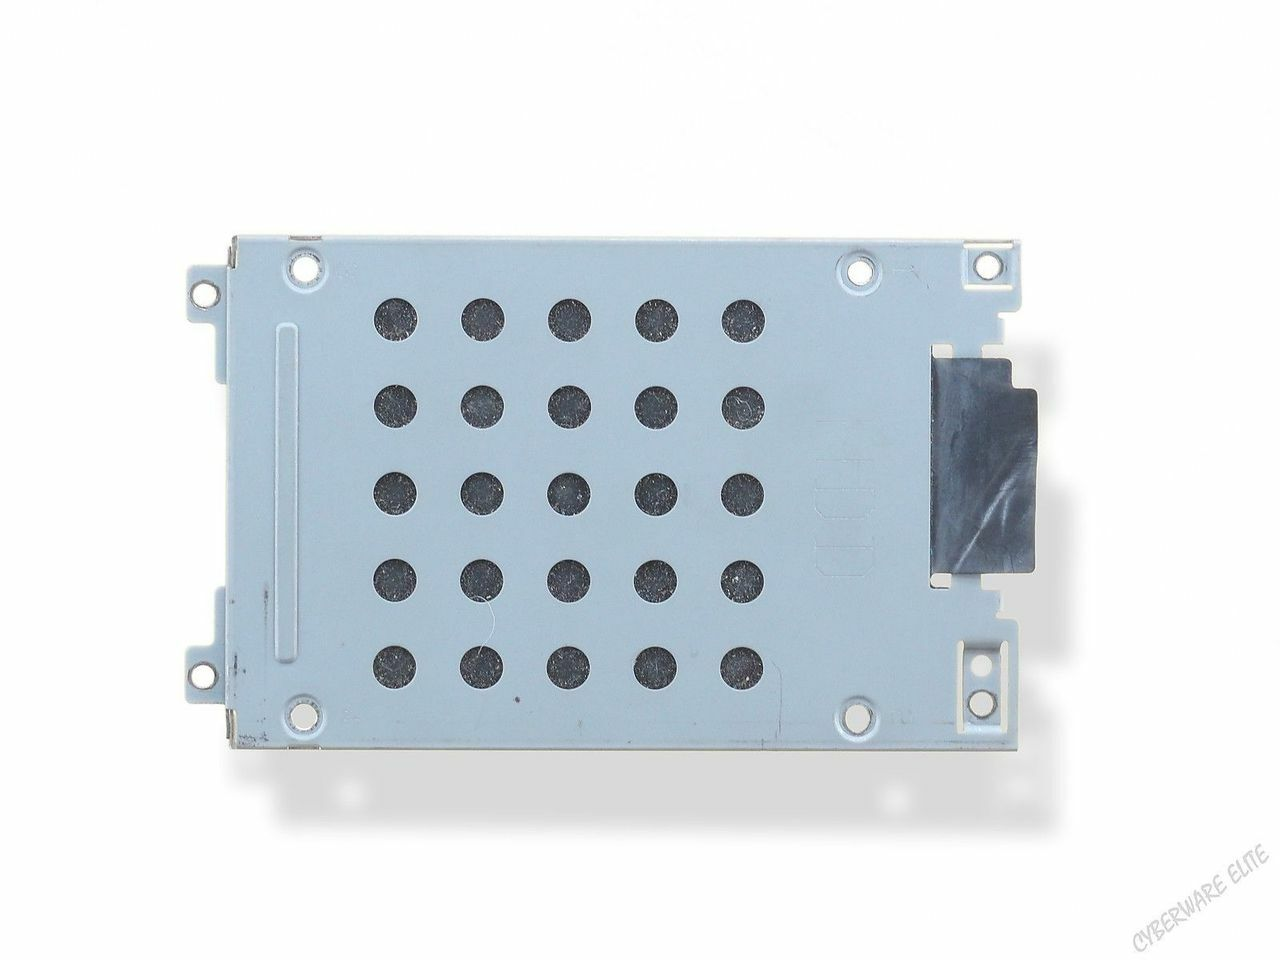 Motherboard Memory Upgrade from OFFTEK 16GB RAM Memory for Asus Z10PR-D16 DDR4-19200 - Reg